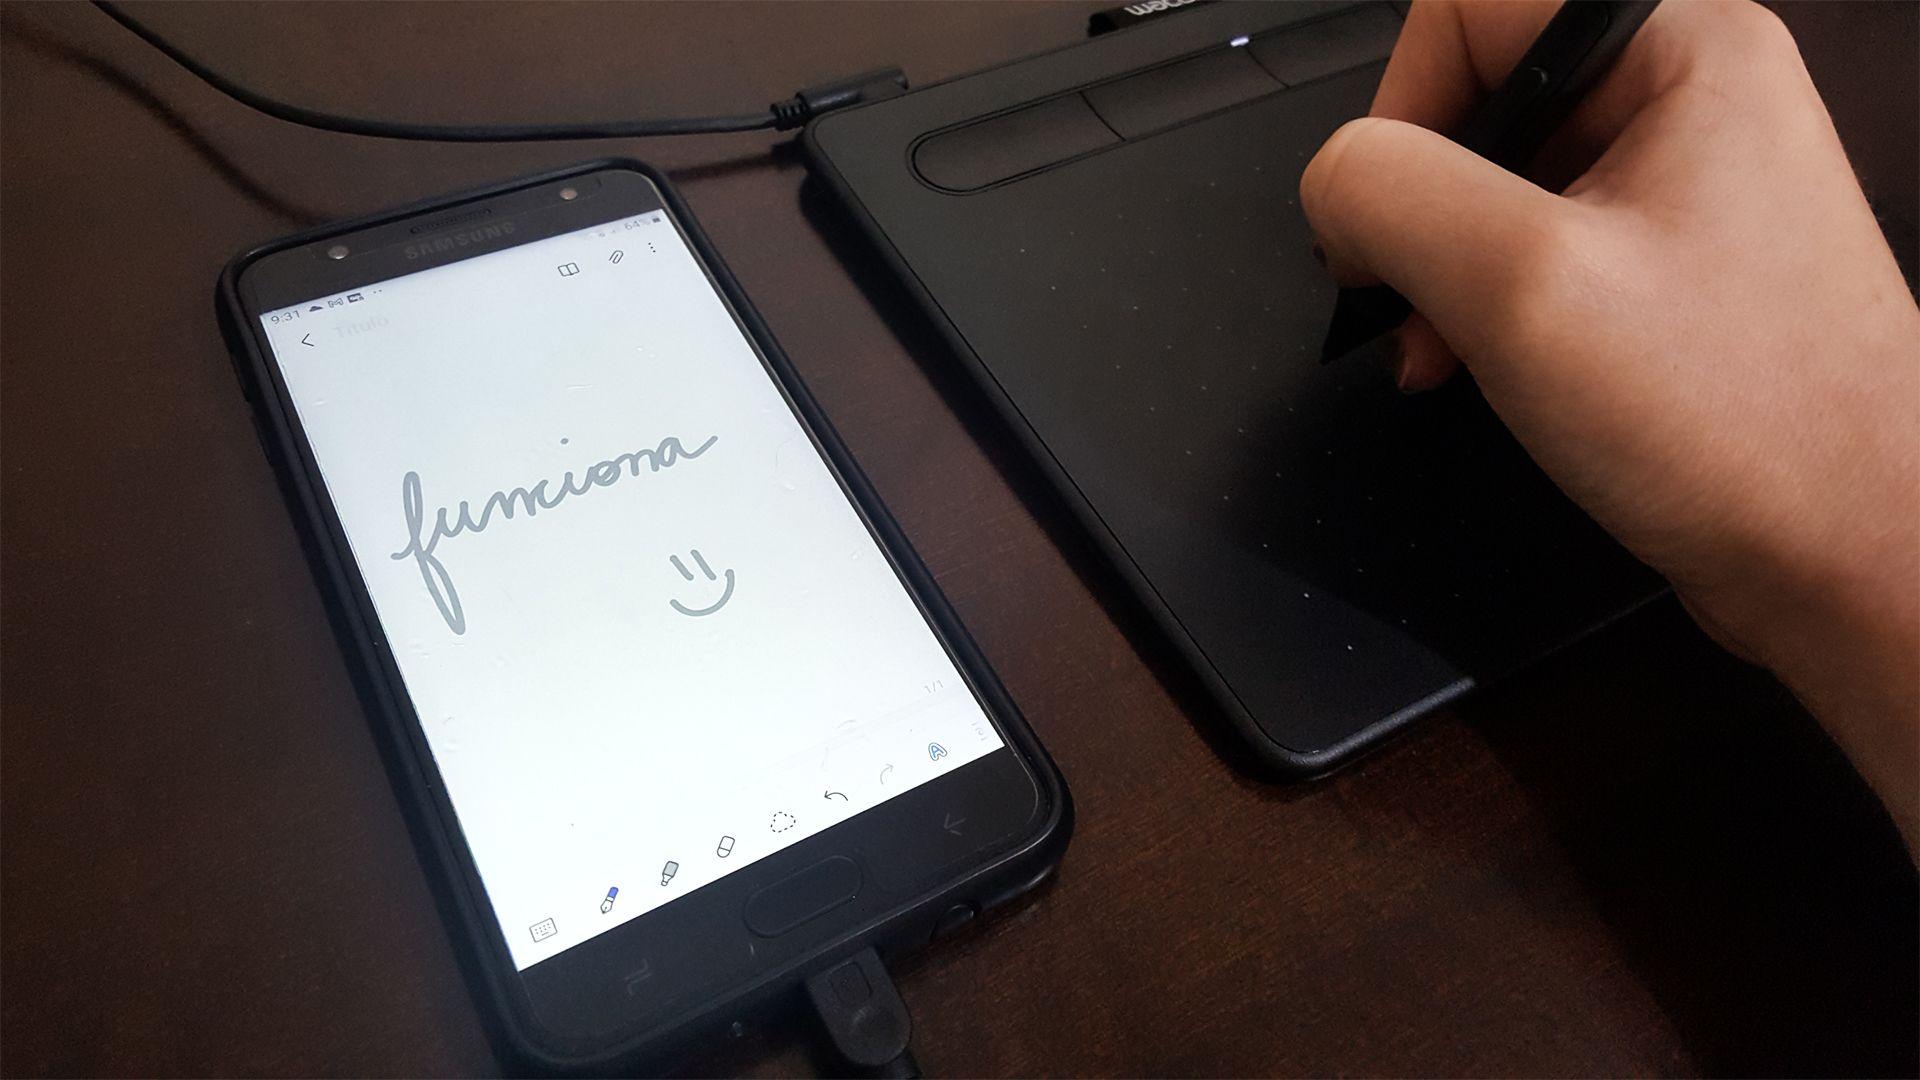 Teste da Wacom Intuos CTL4100 no celular (Foto: Isabel Marlasca/Zoom)